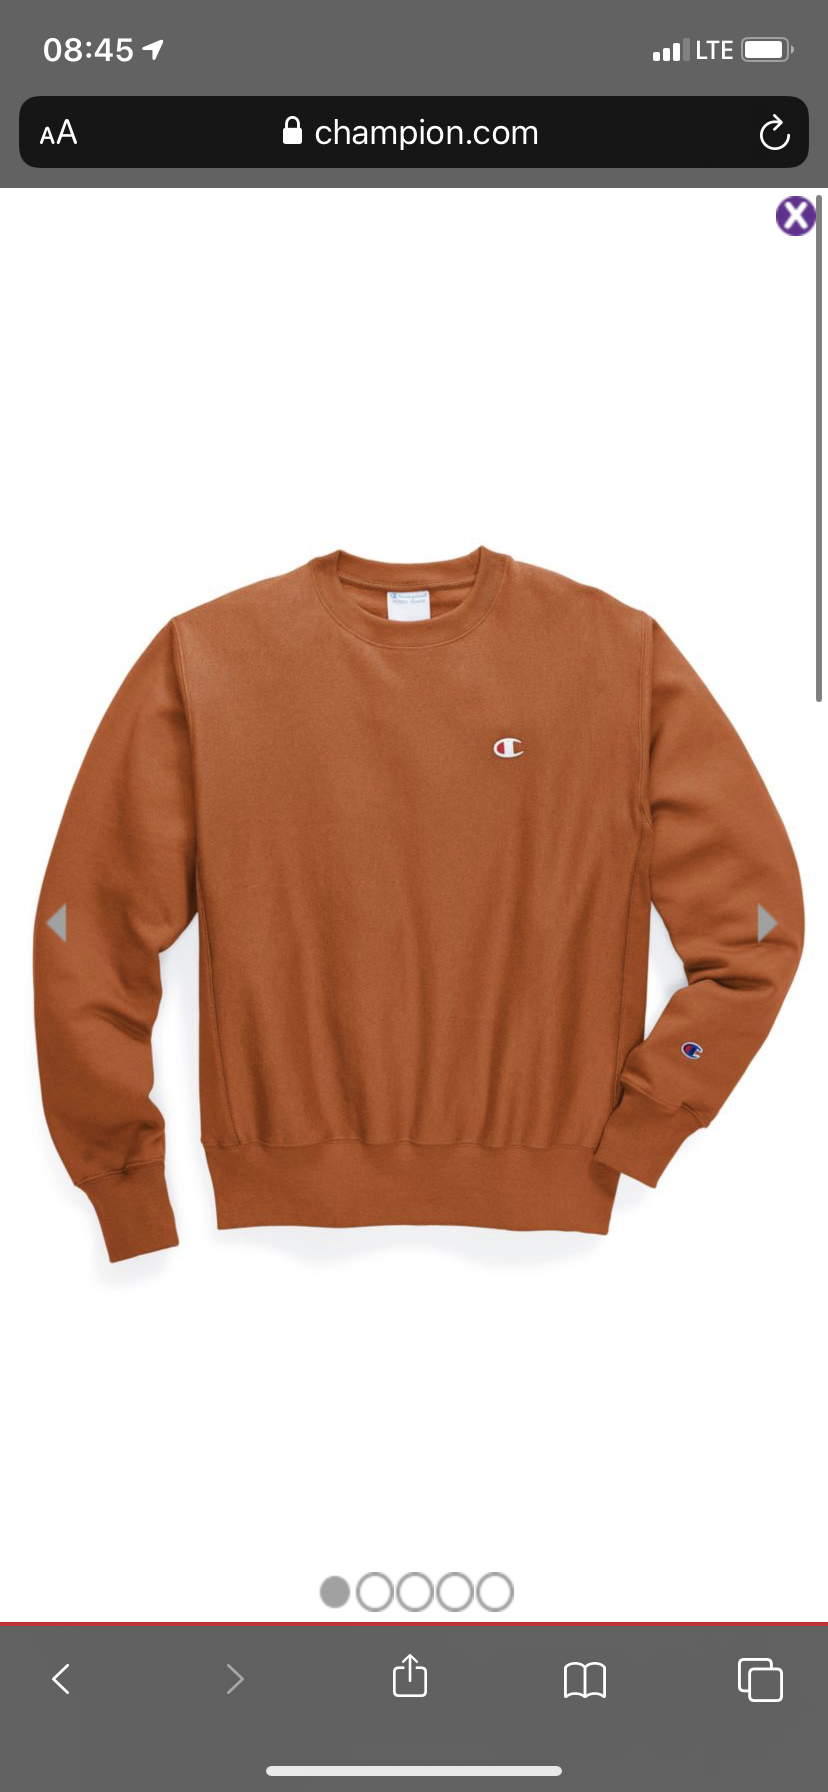 Champion Life Men S Reverse Weave Sweatshirt Cargo Olive Navy Burnt Orange Size Large Mens Sweatshirts Hoodie Sweatshirts Orange Champion Hoodie [ 1792 x 828 Pixel ]